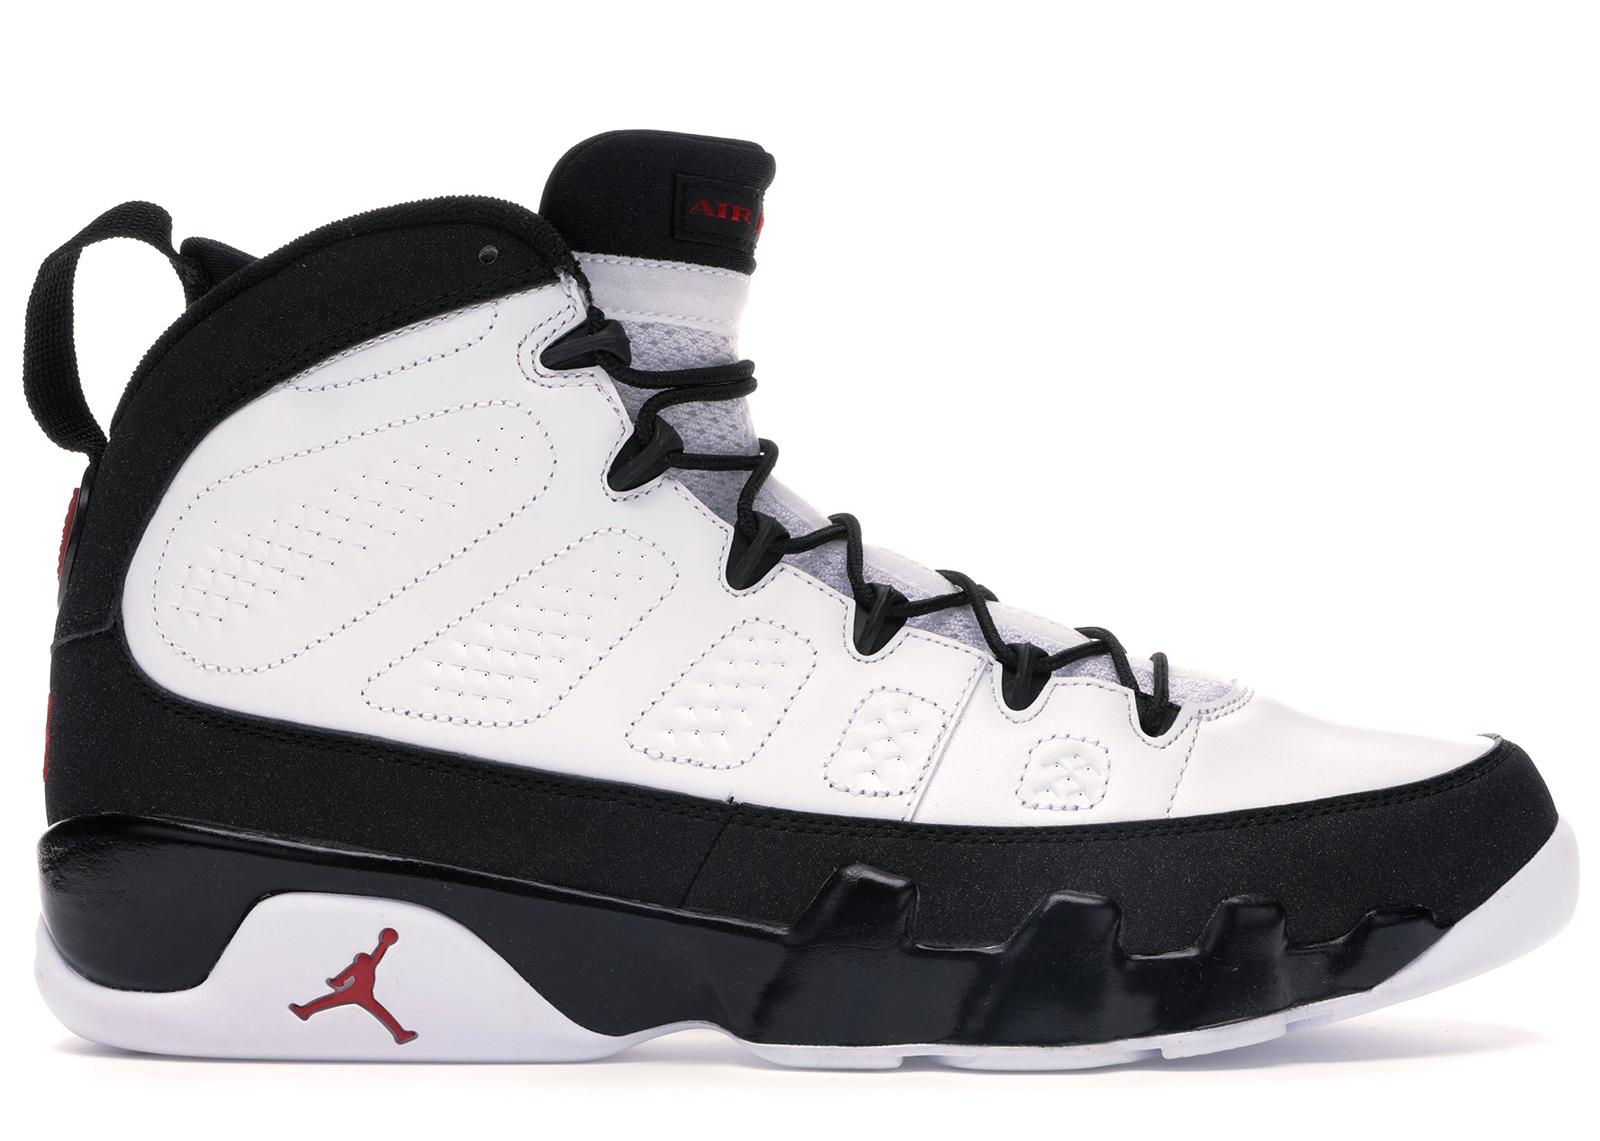 Jordan 9 Retro White Black Red (2010